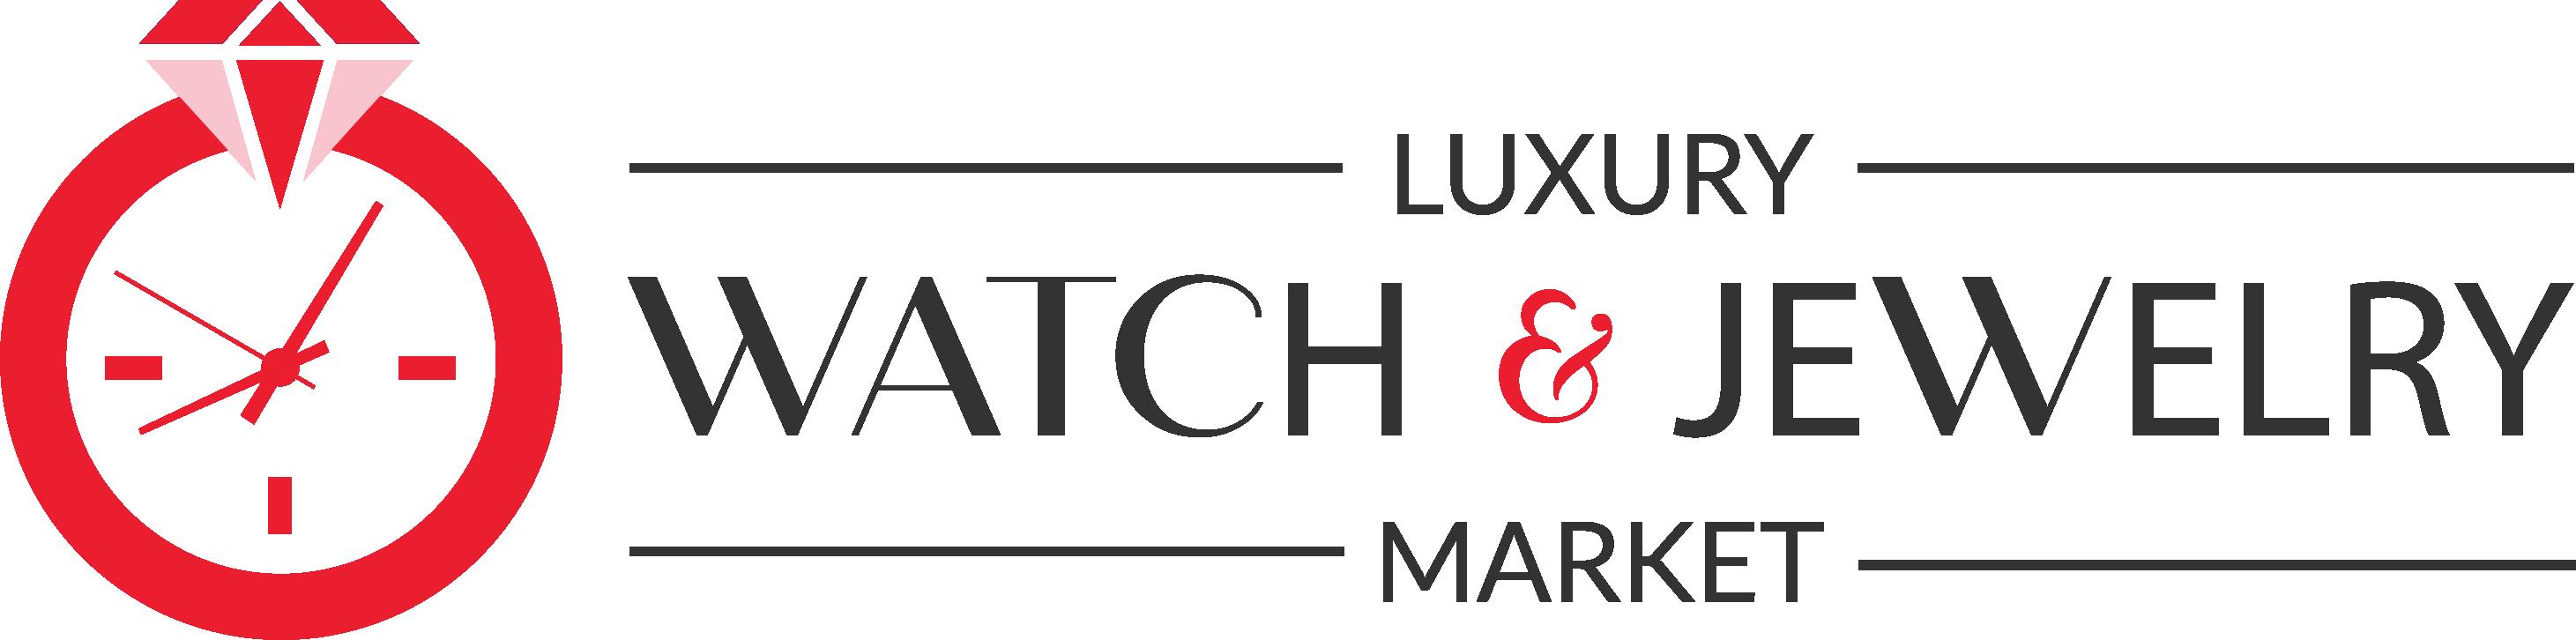 luxury watch and jewelry market